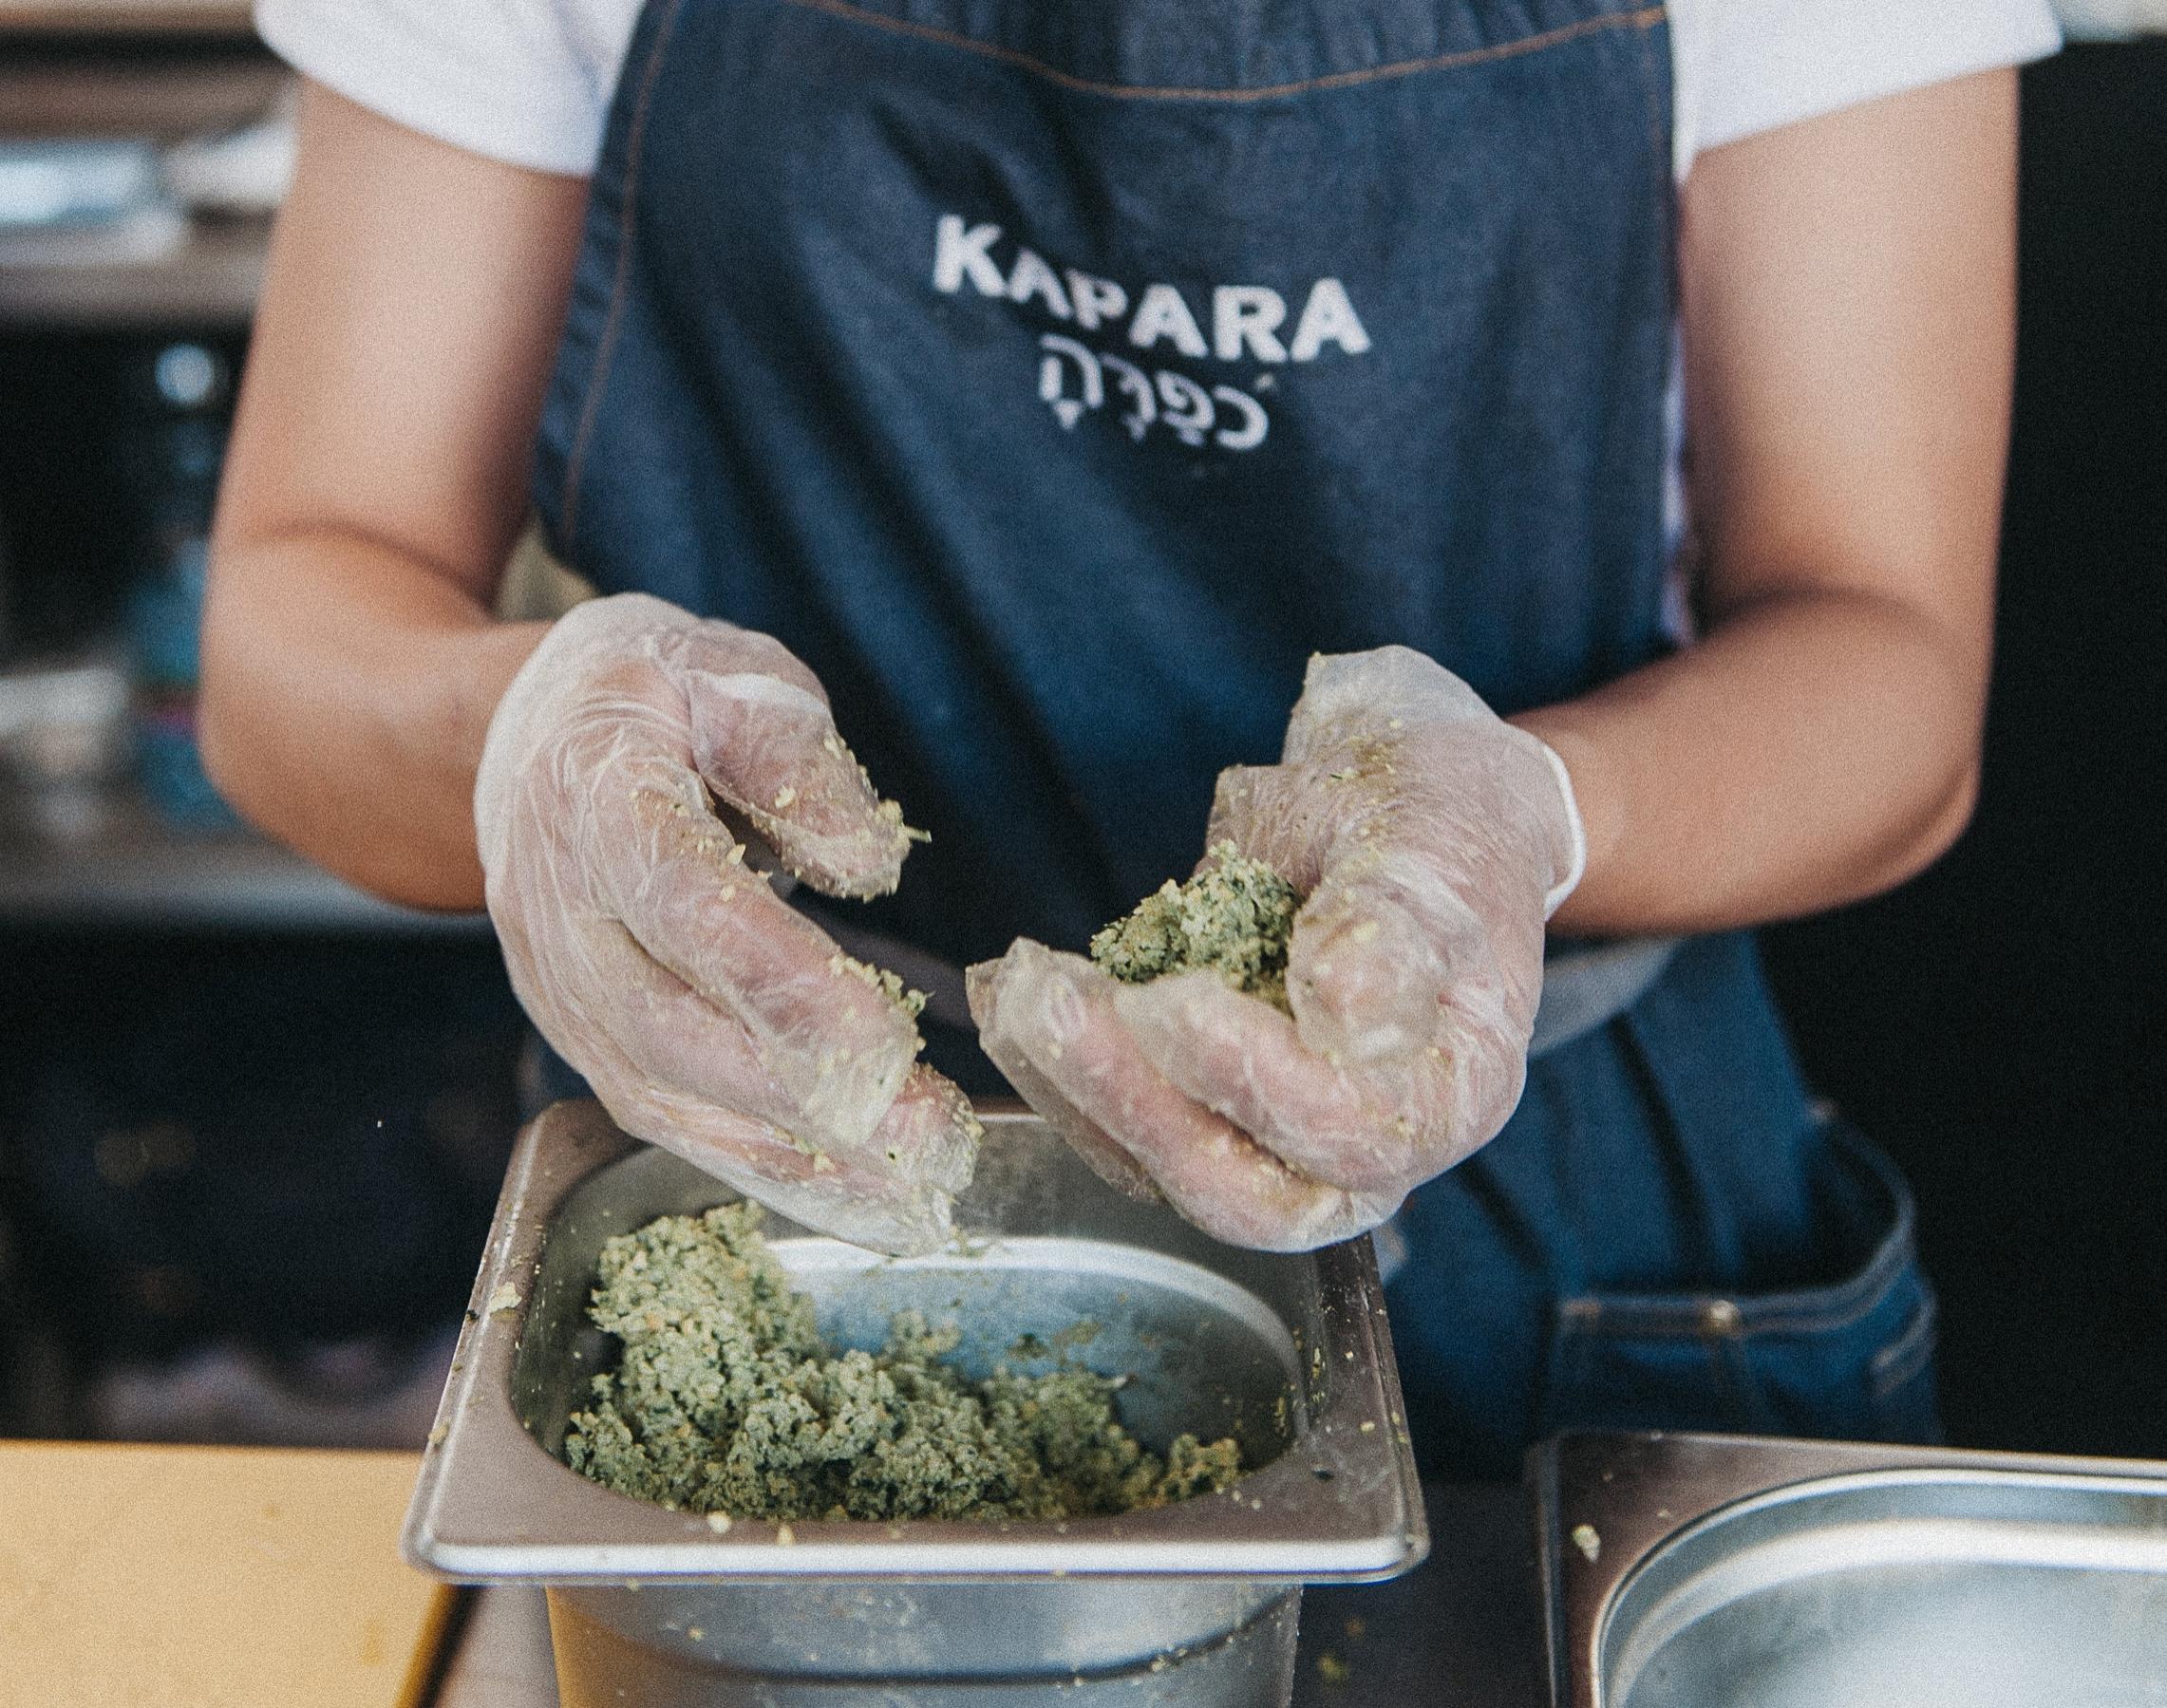 Manifesto-Market-Kapara-2018-9779.jpg